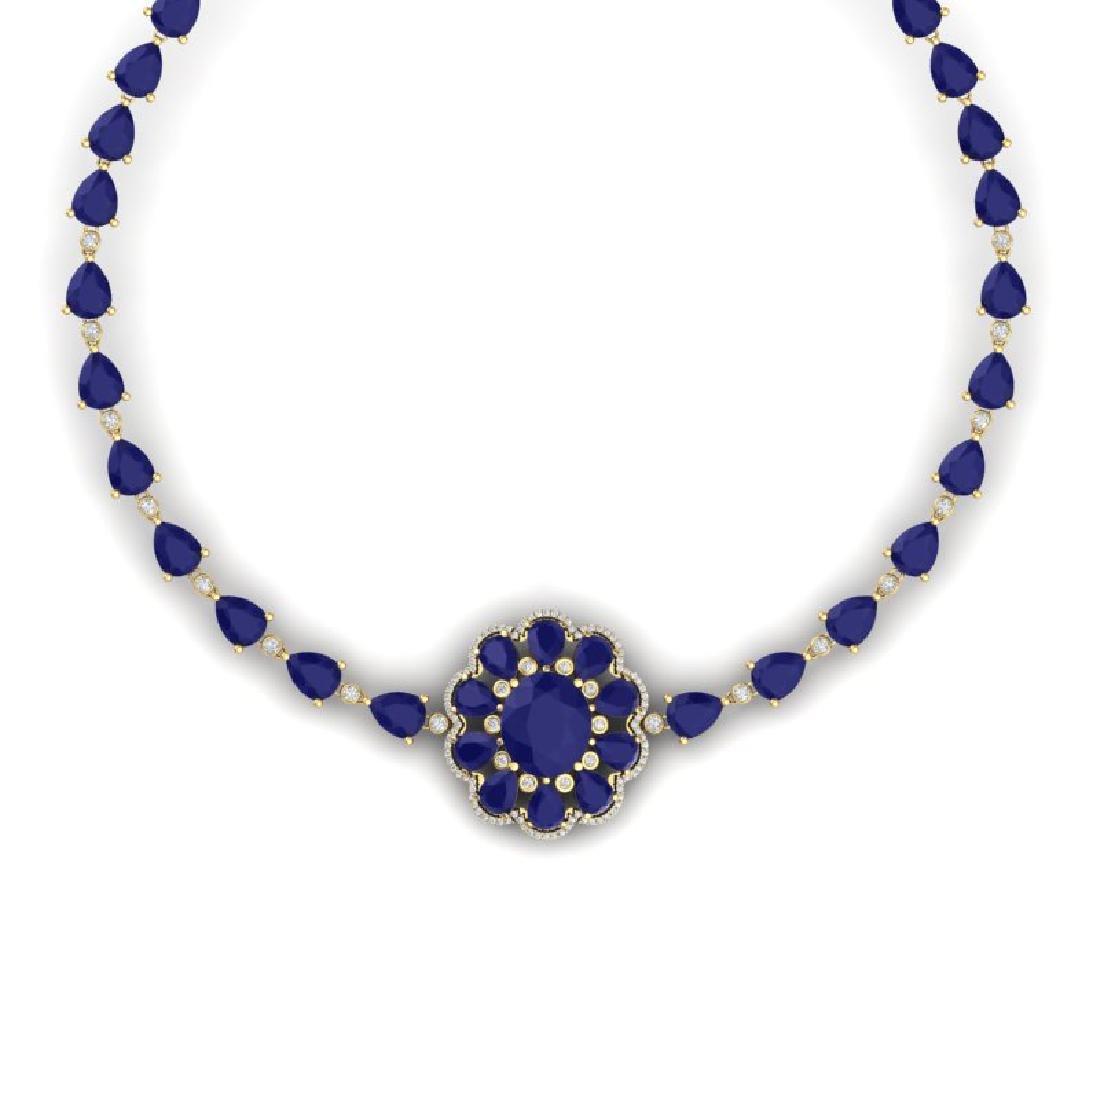 78.98 CTW Royalty Sapphire & VS Diamond Necklace 18K - 2